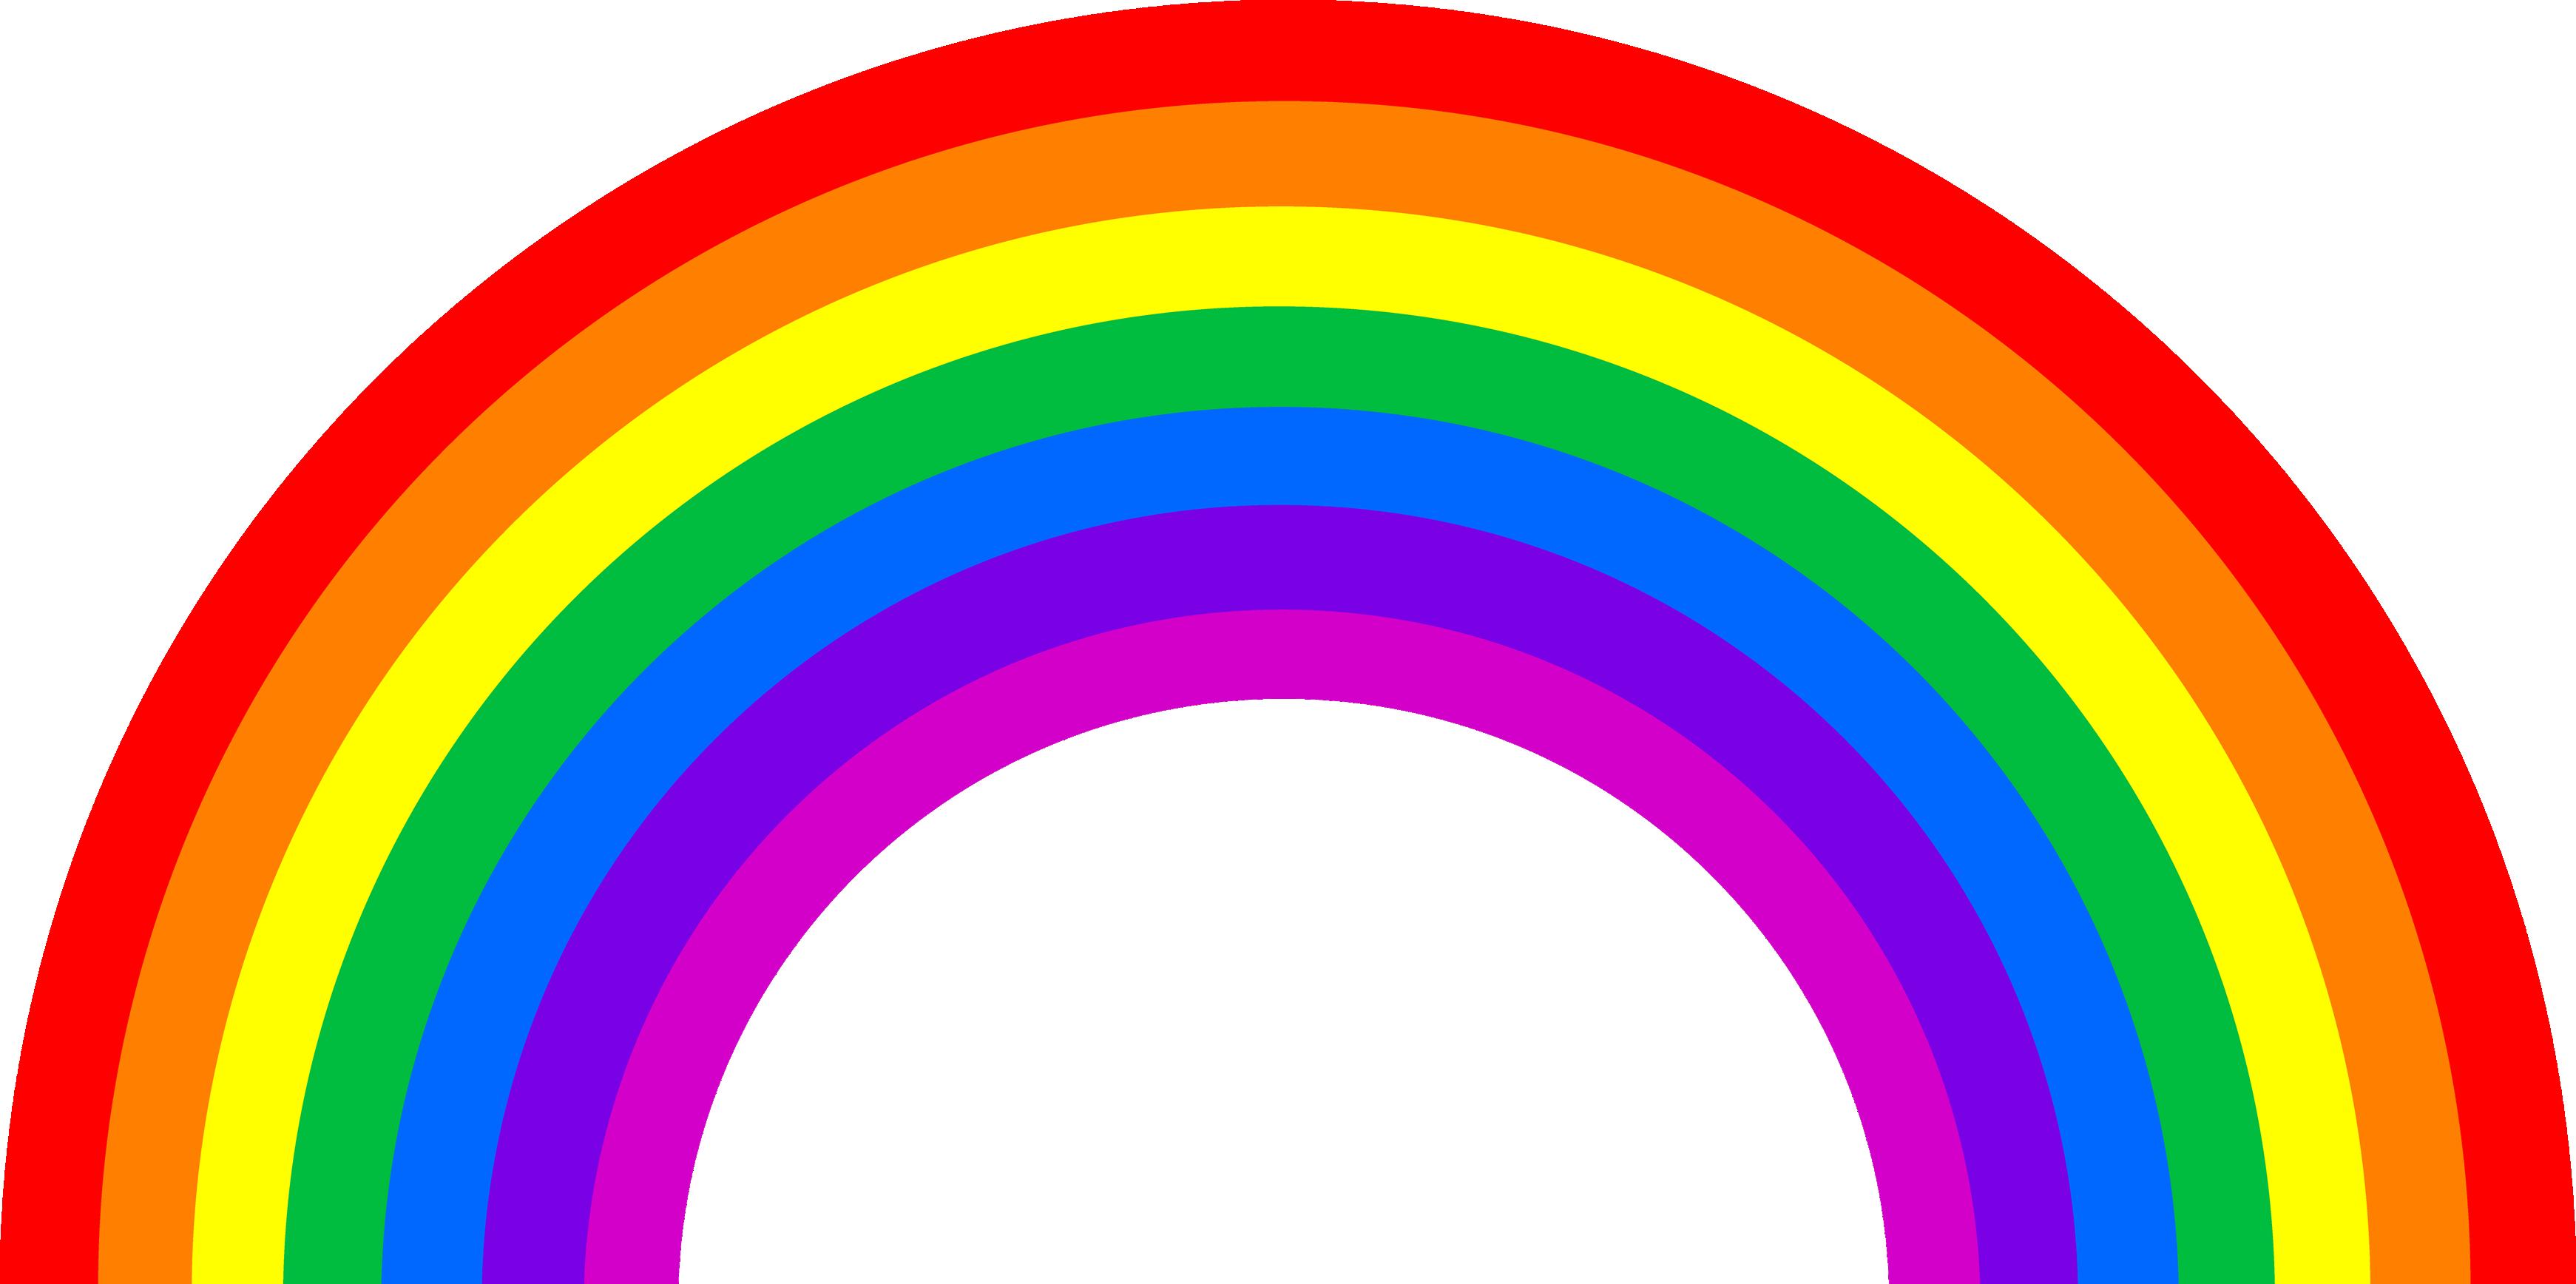 Rainbow Transparent Background.